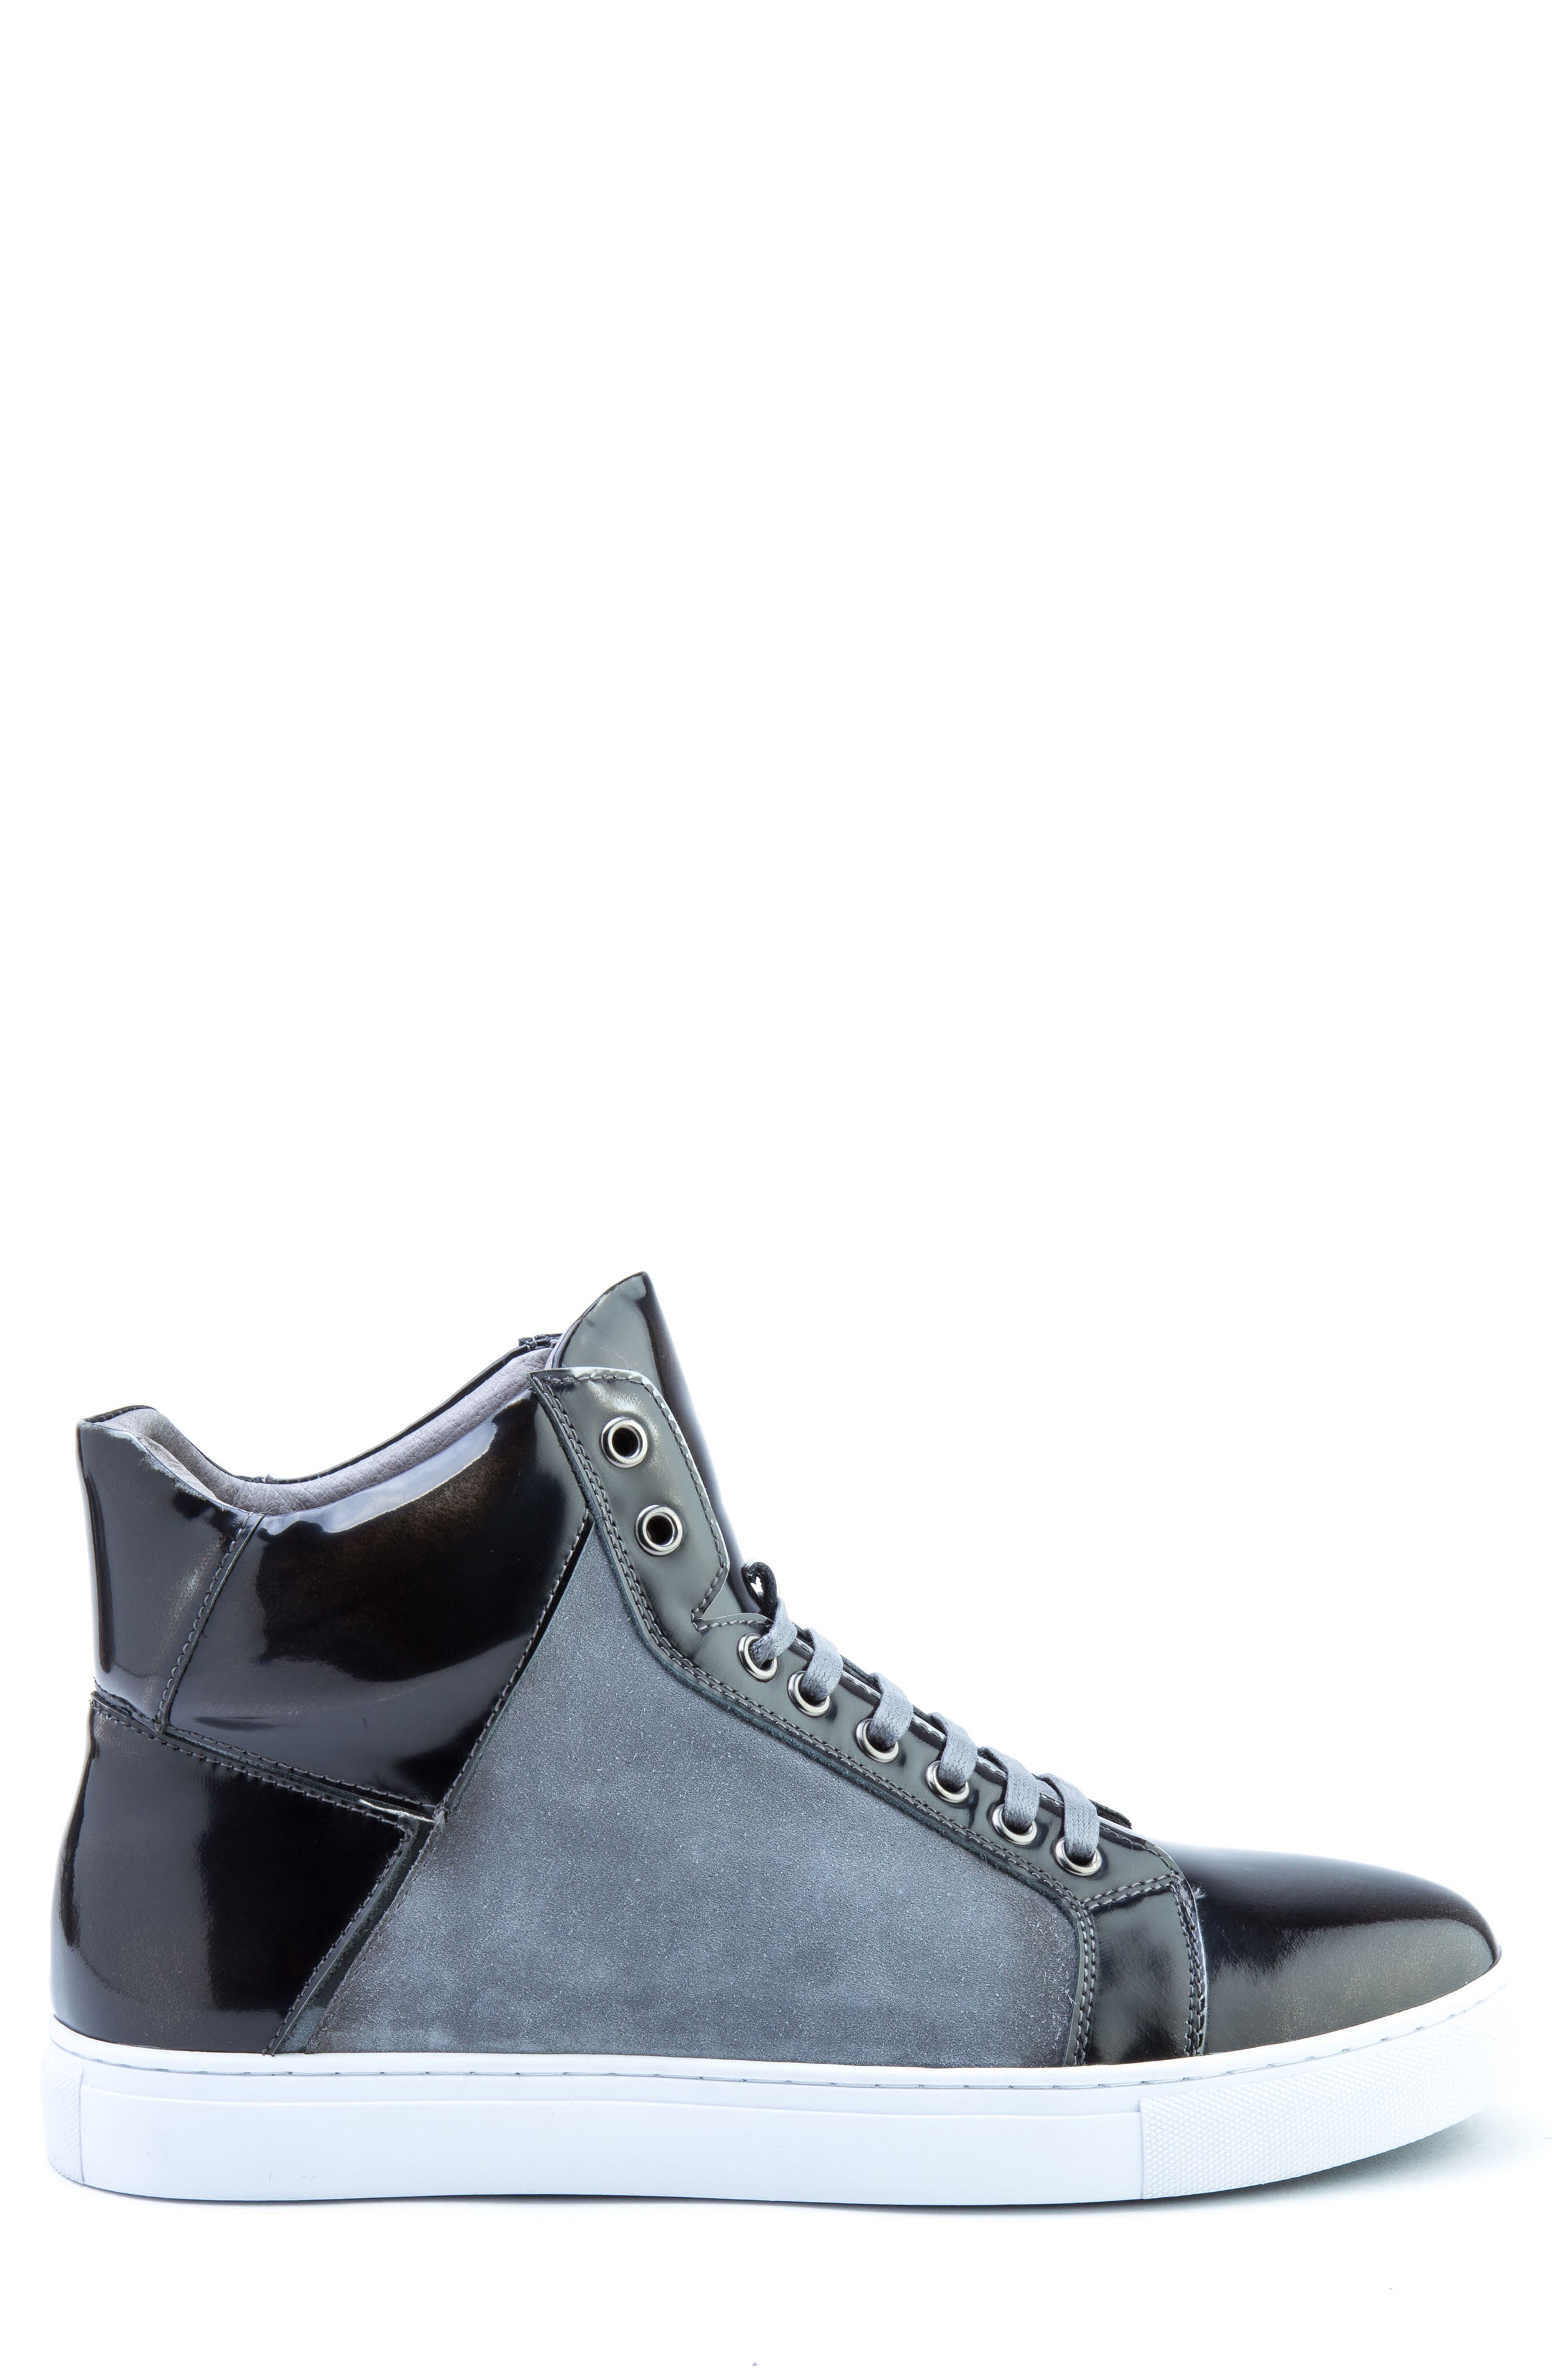 BADGLEY MISCHKA COLLECTION, Badgley Mischka Douglas High Top Sneaker, Alternate thumbnail 3, color, 001